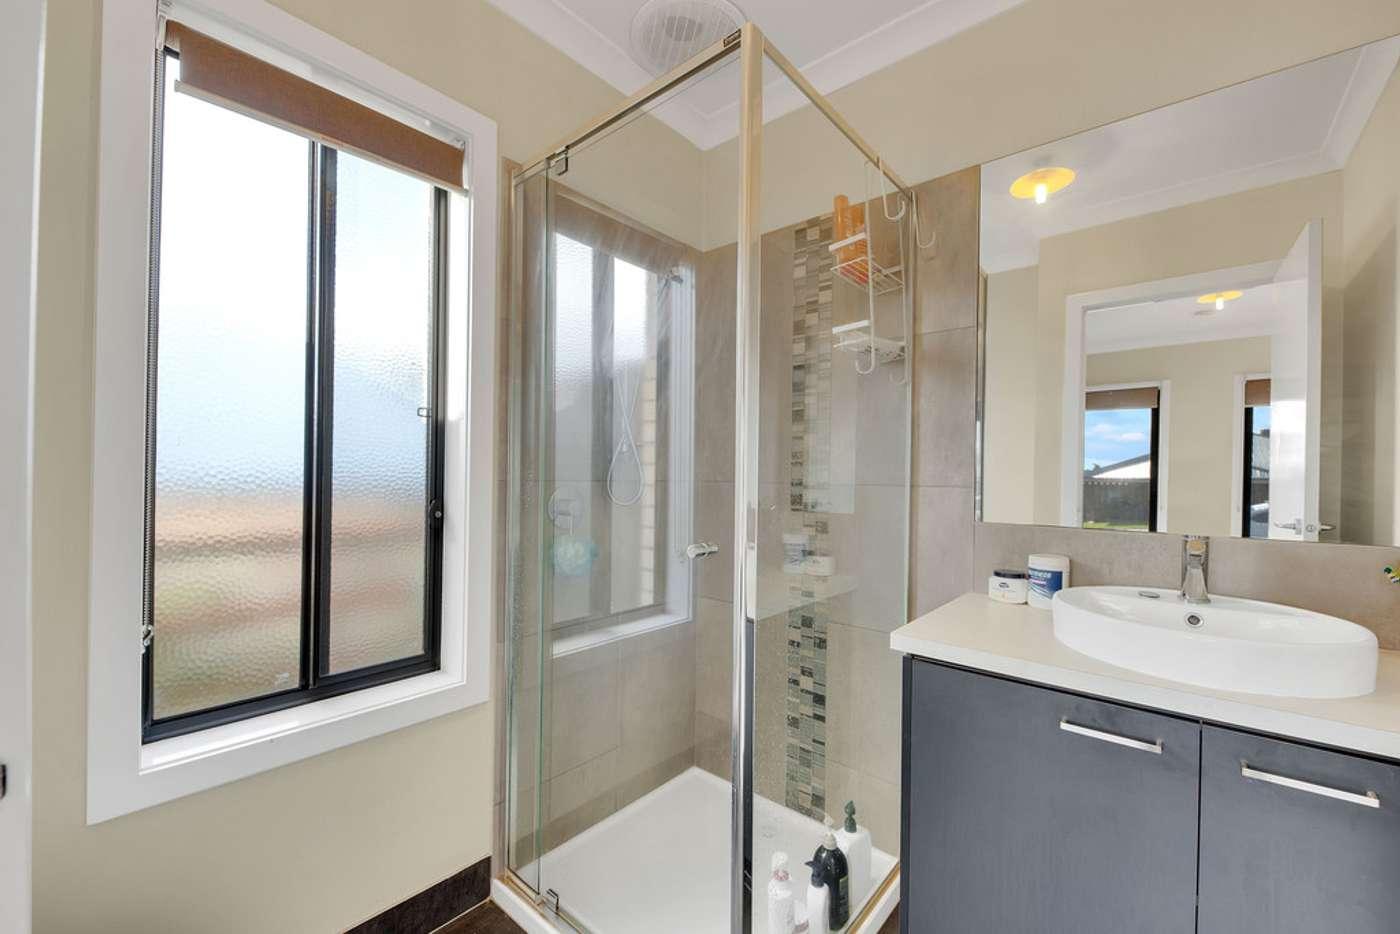 Sixth view of Homely house listing, 9 McAuliffe Street, Wodonga VIC 3690